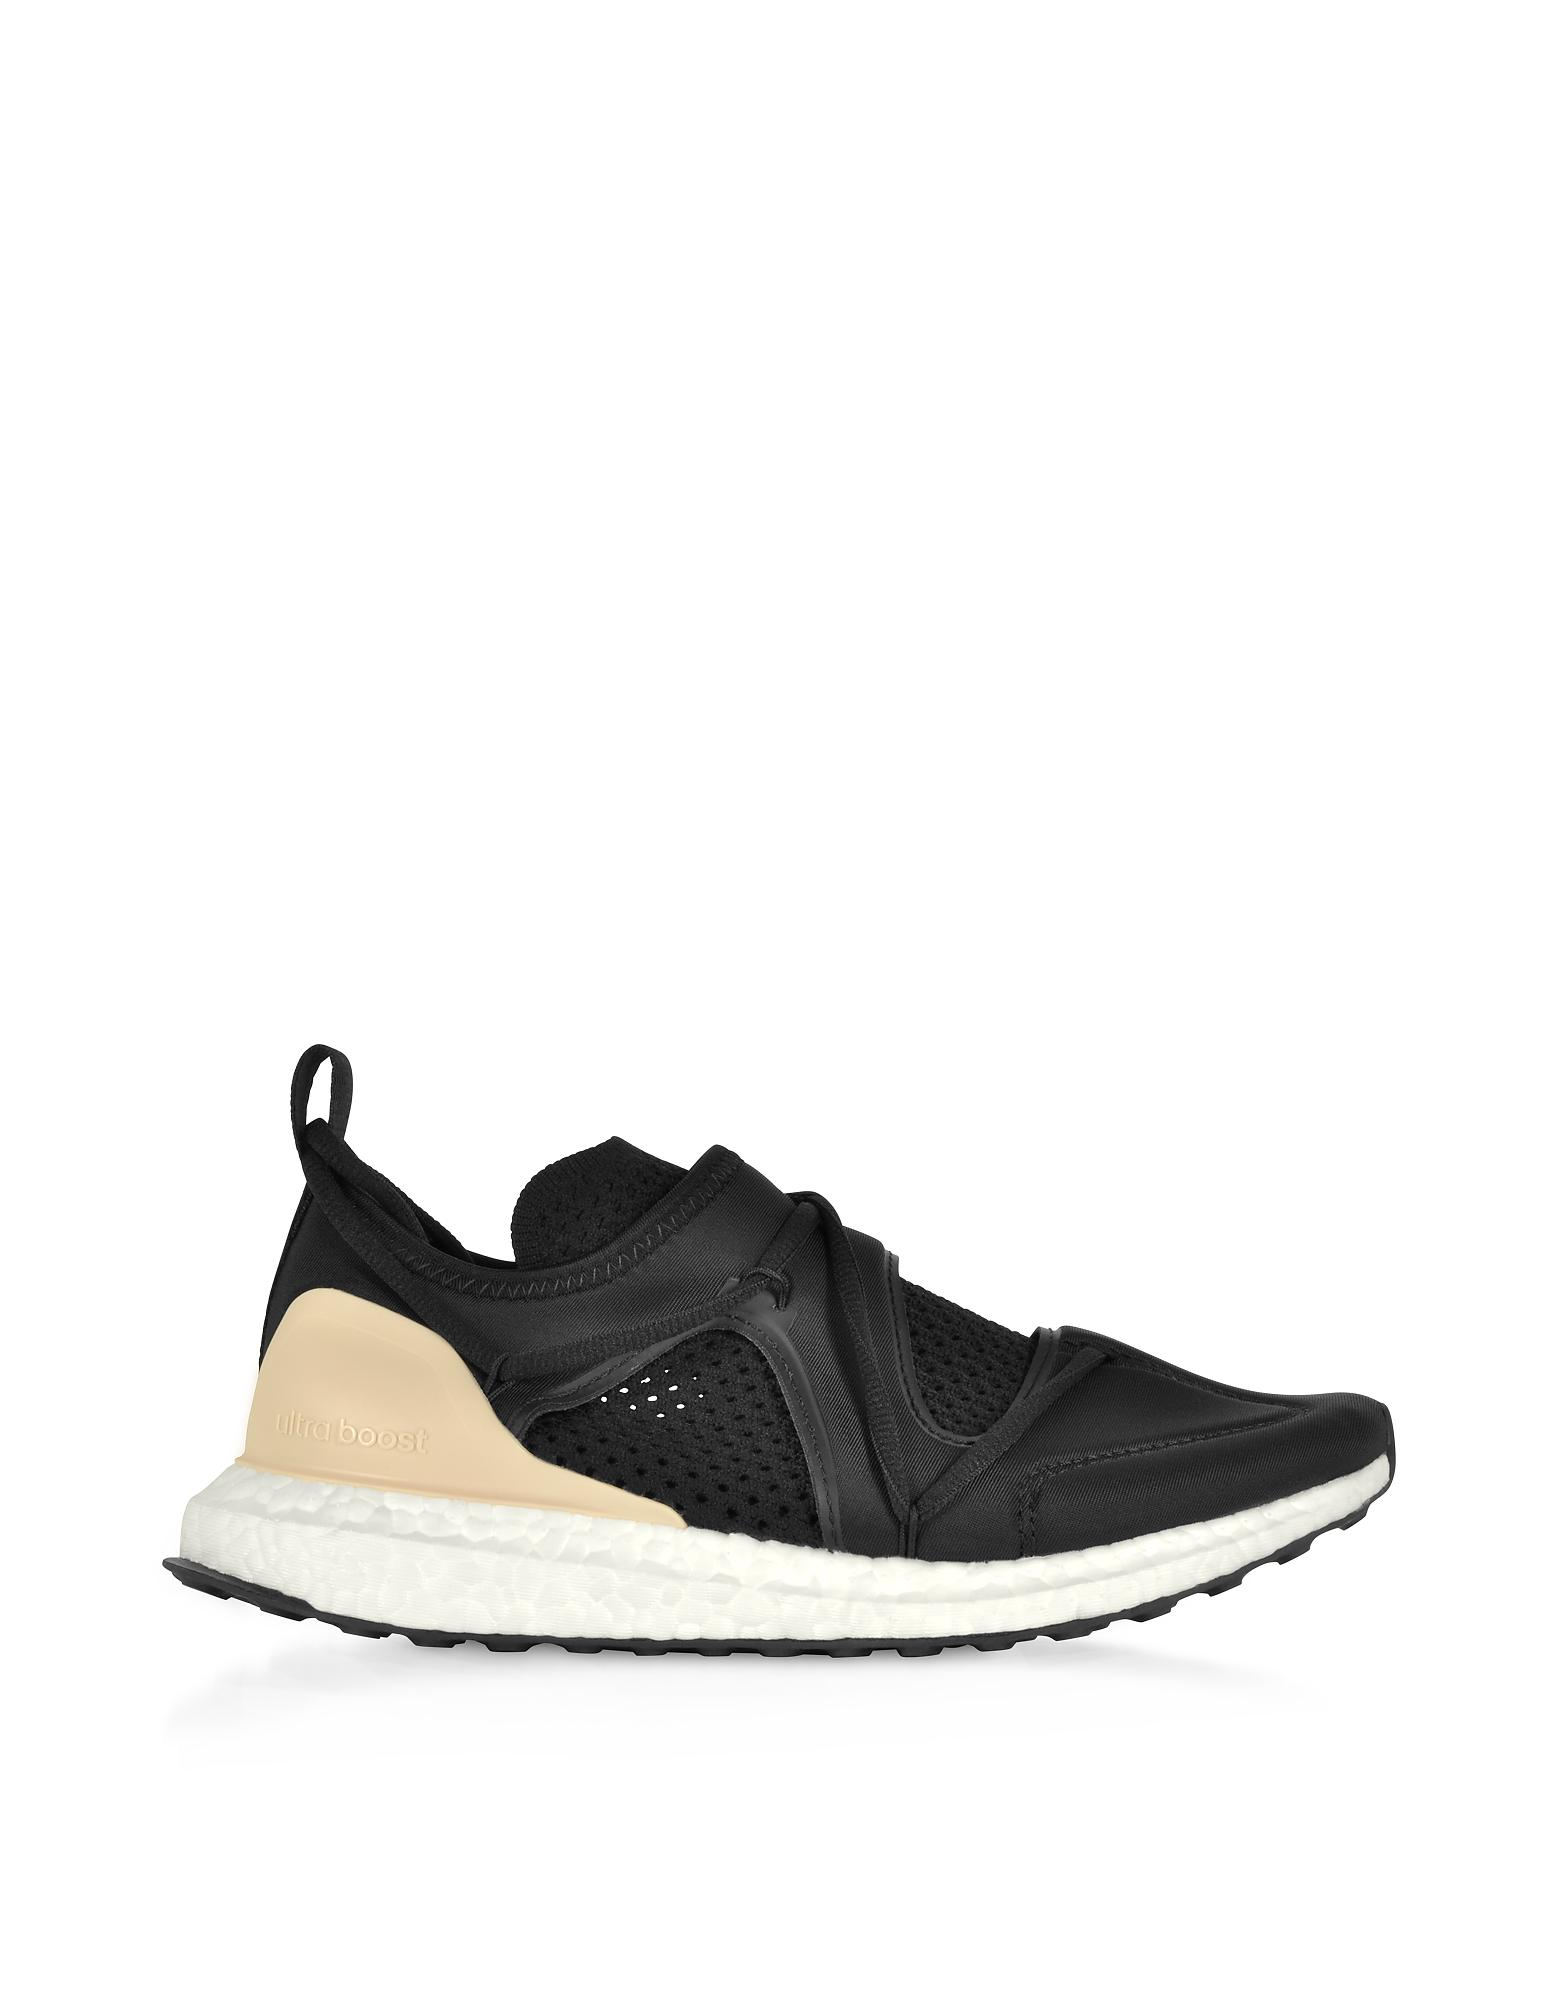 quality design 3cac0 9cdda adidas By Stella McCartney. Women s Ultraboost T Black Nylon Running  Sneakers